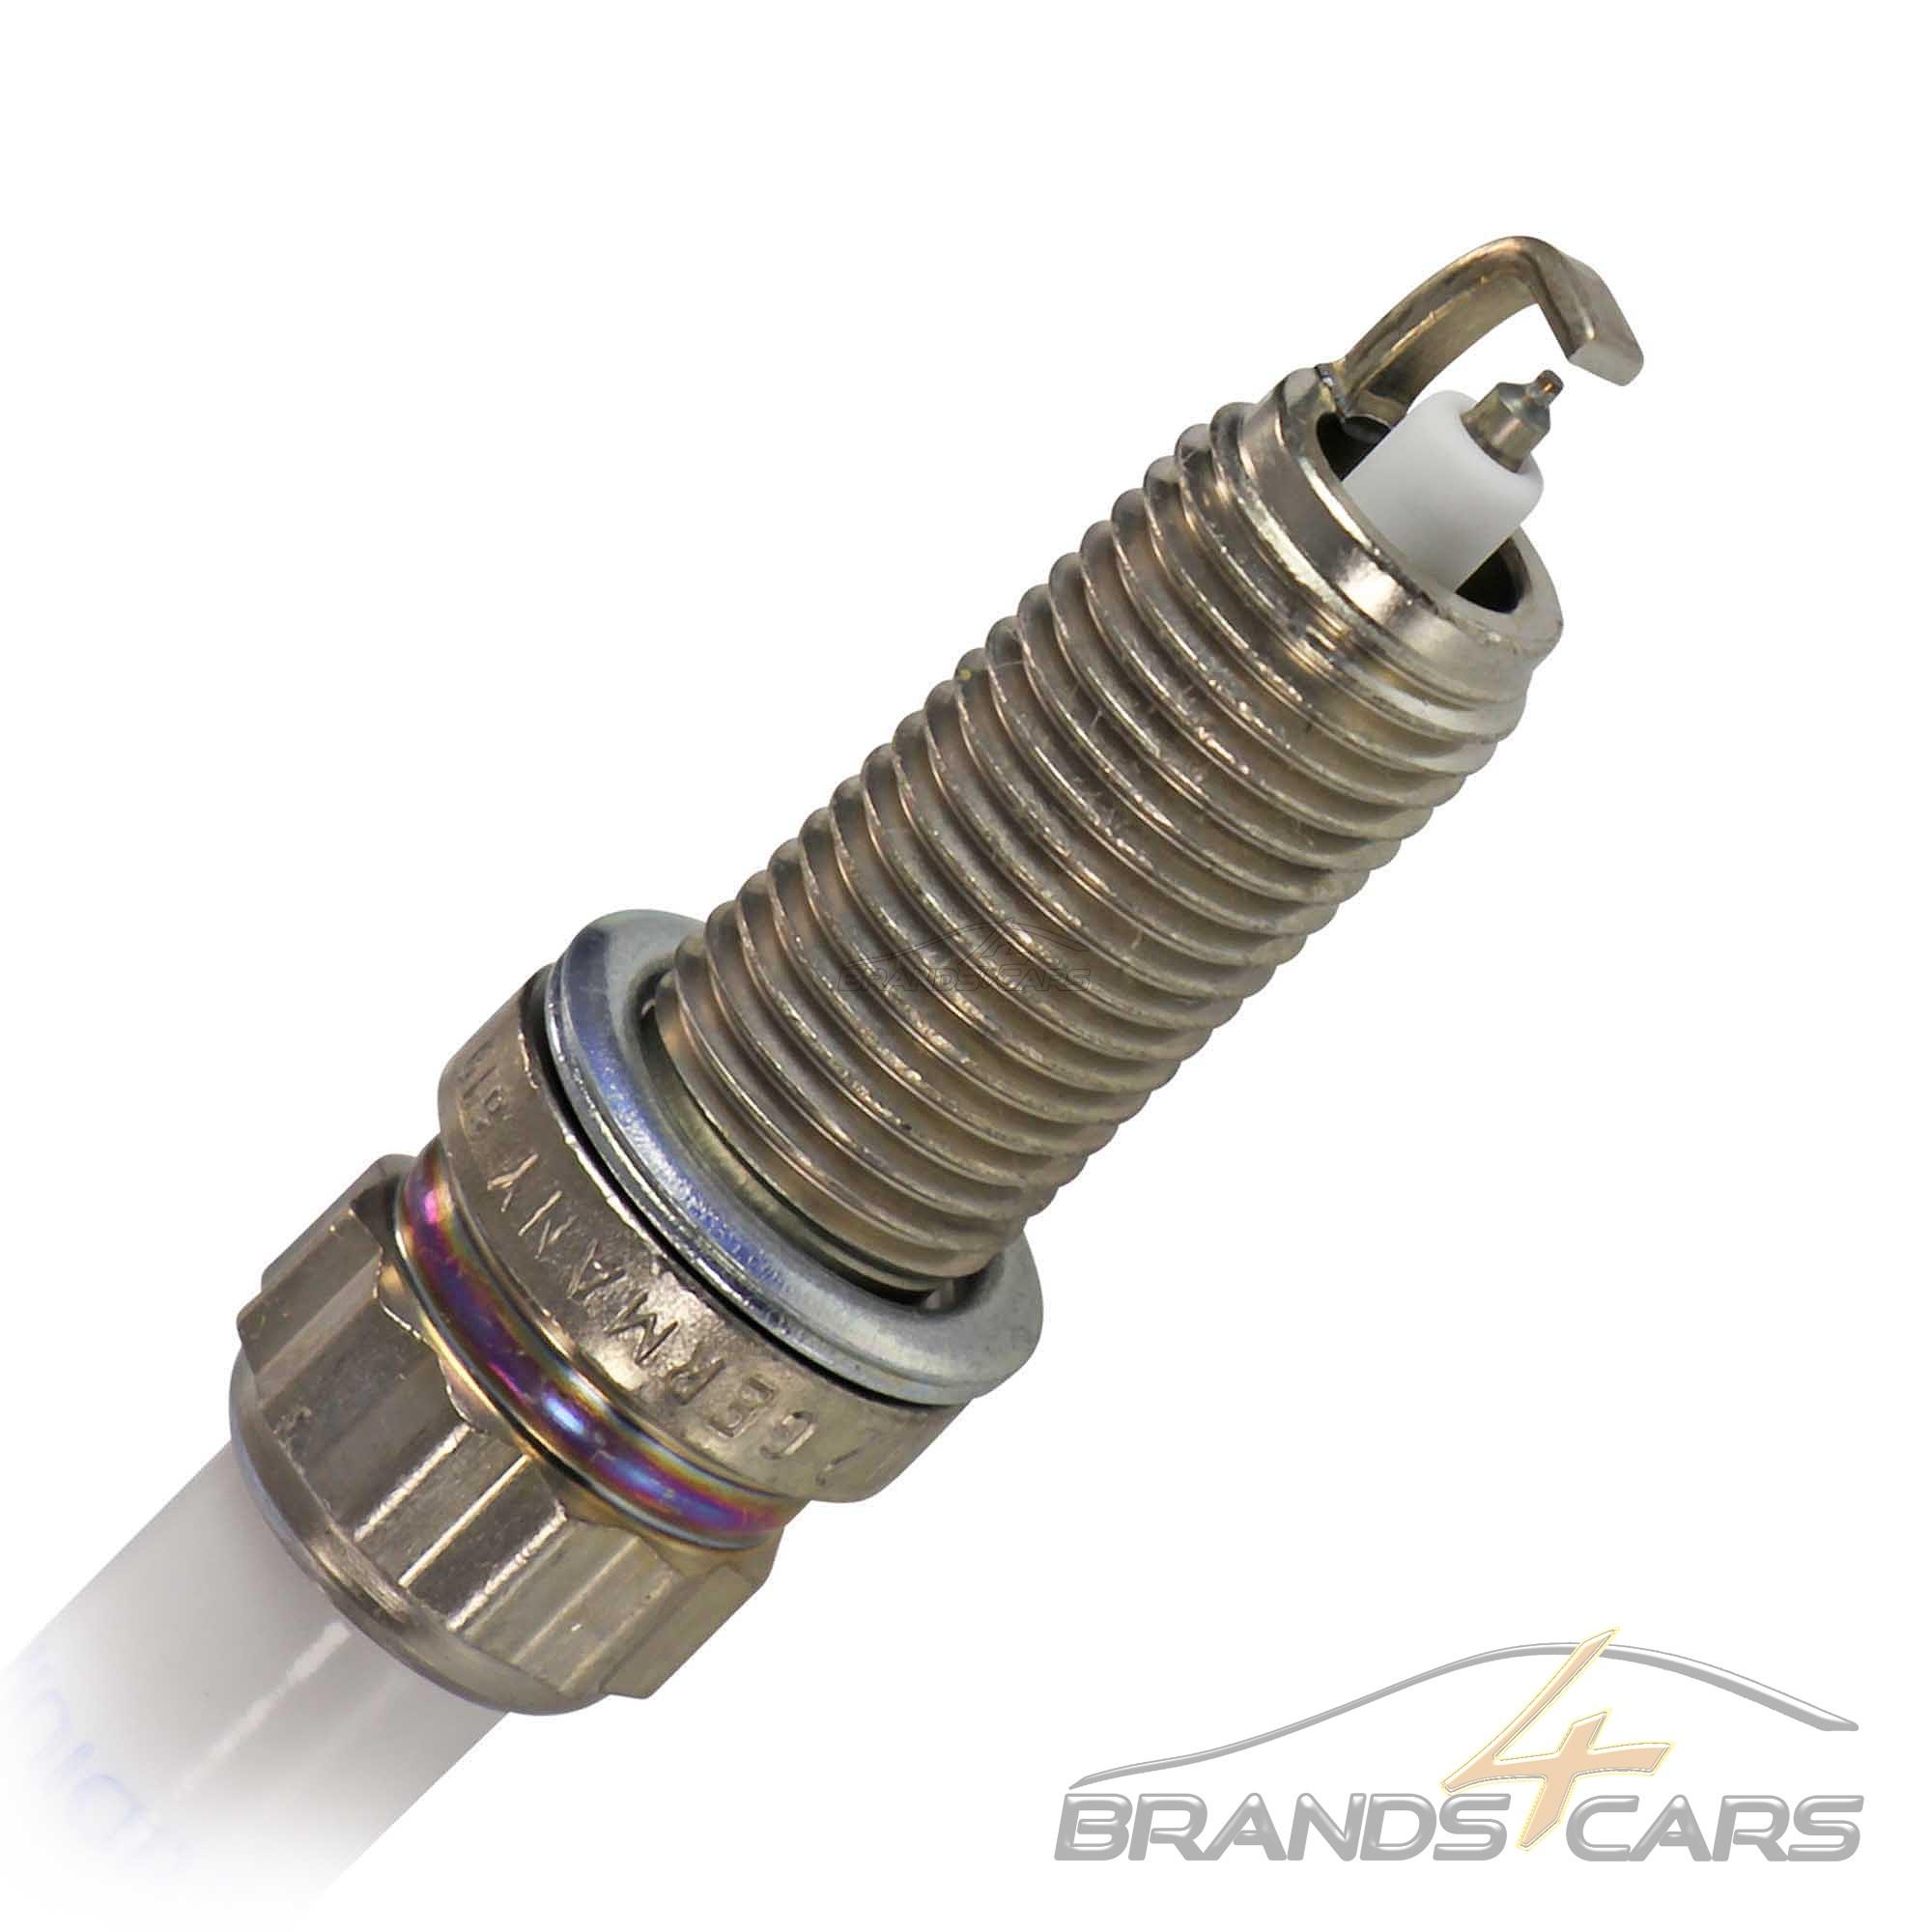 4x-Bosch-original-bujia-bujias-mini-mini-r56-r57-club-hombre-r55-one-Cooper miniatura 5